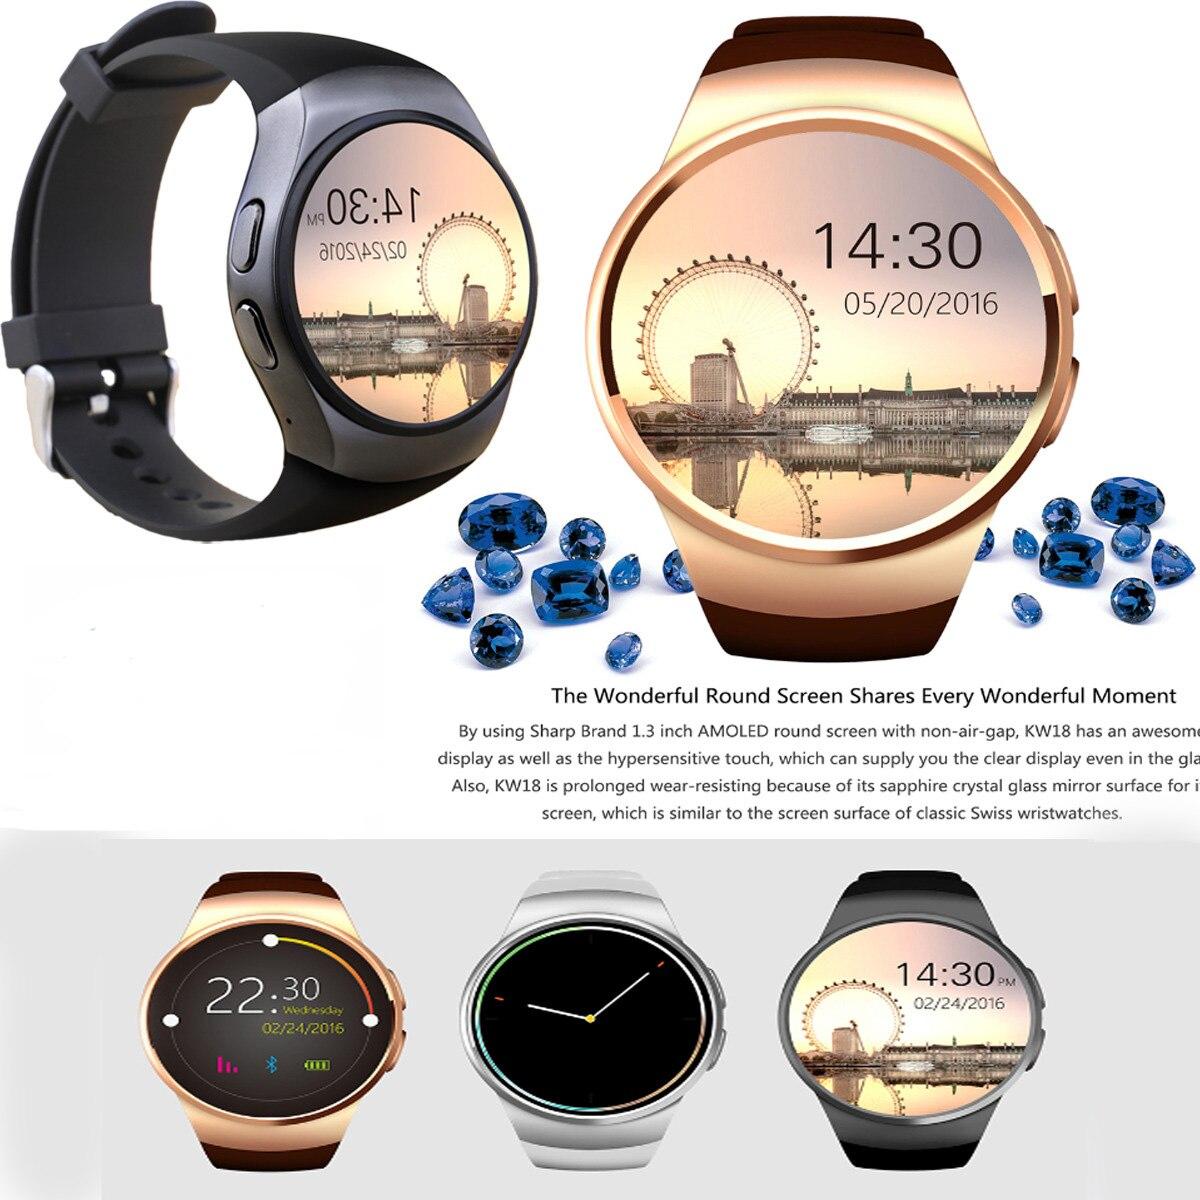 New Waterproof Smart Bluetooth Watch 16GB bracelet sports meter heart Rate TestNew Waterproof Smart Bluetooth Watch 16GB bracelet sports meter heart Rate Test